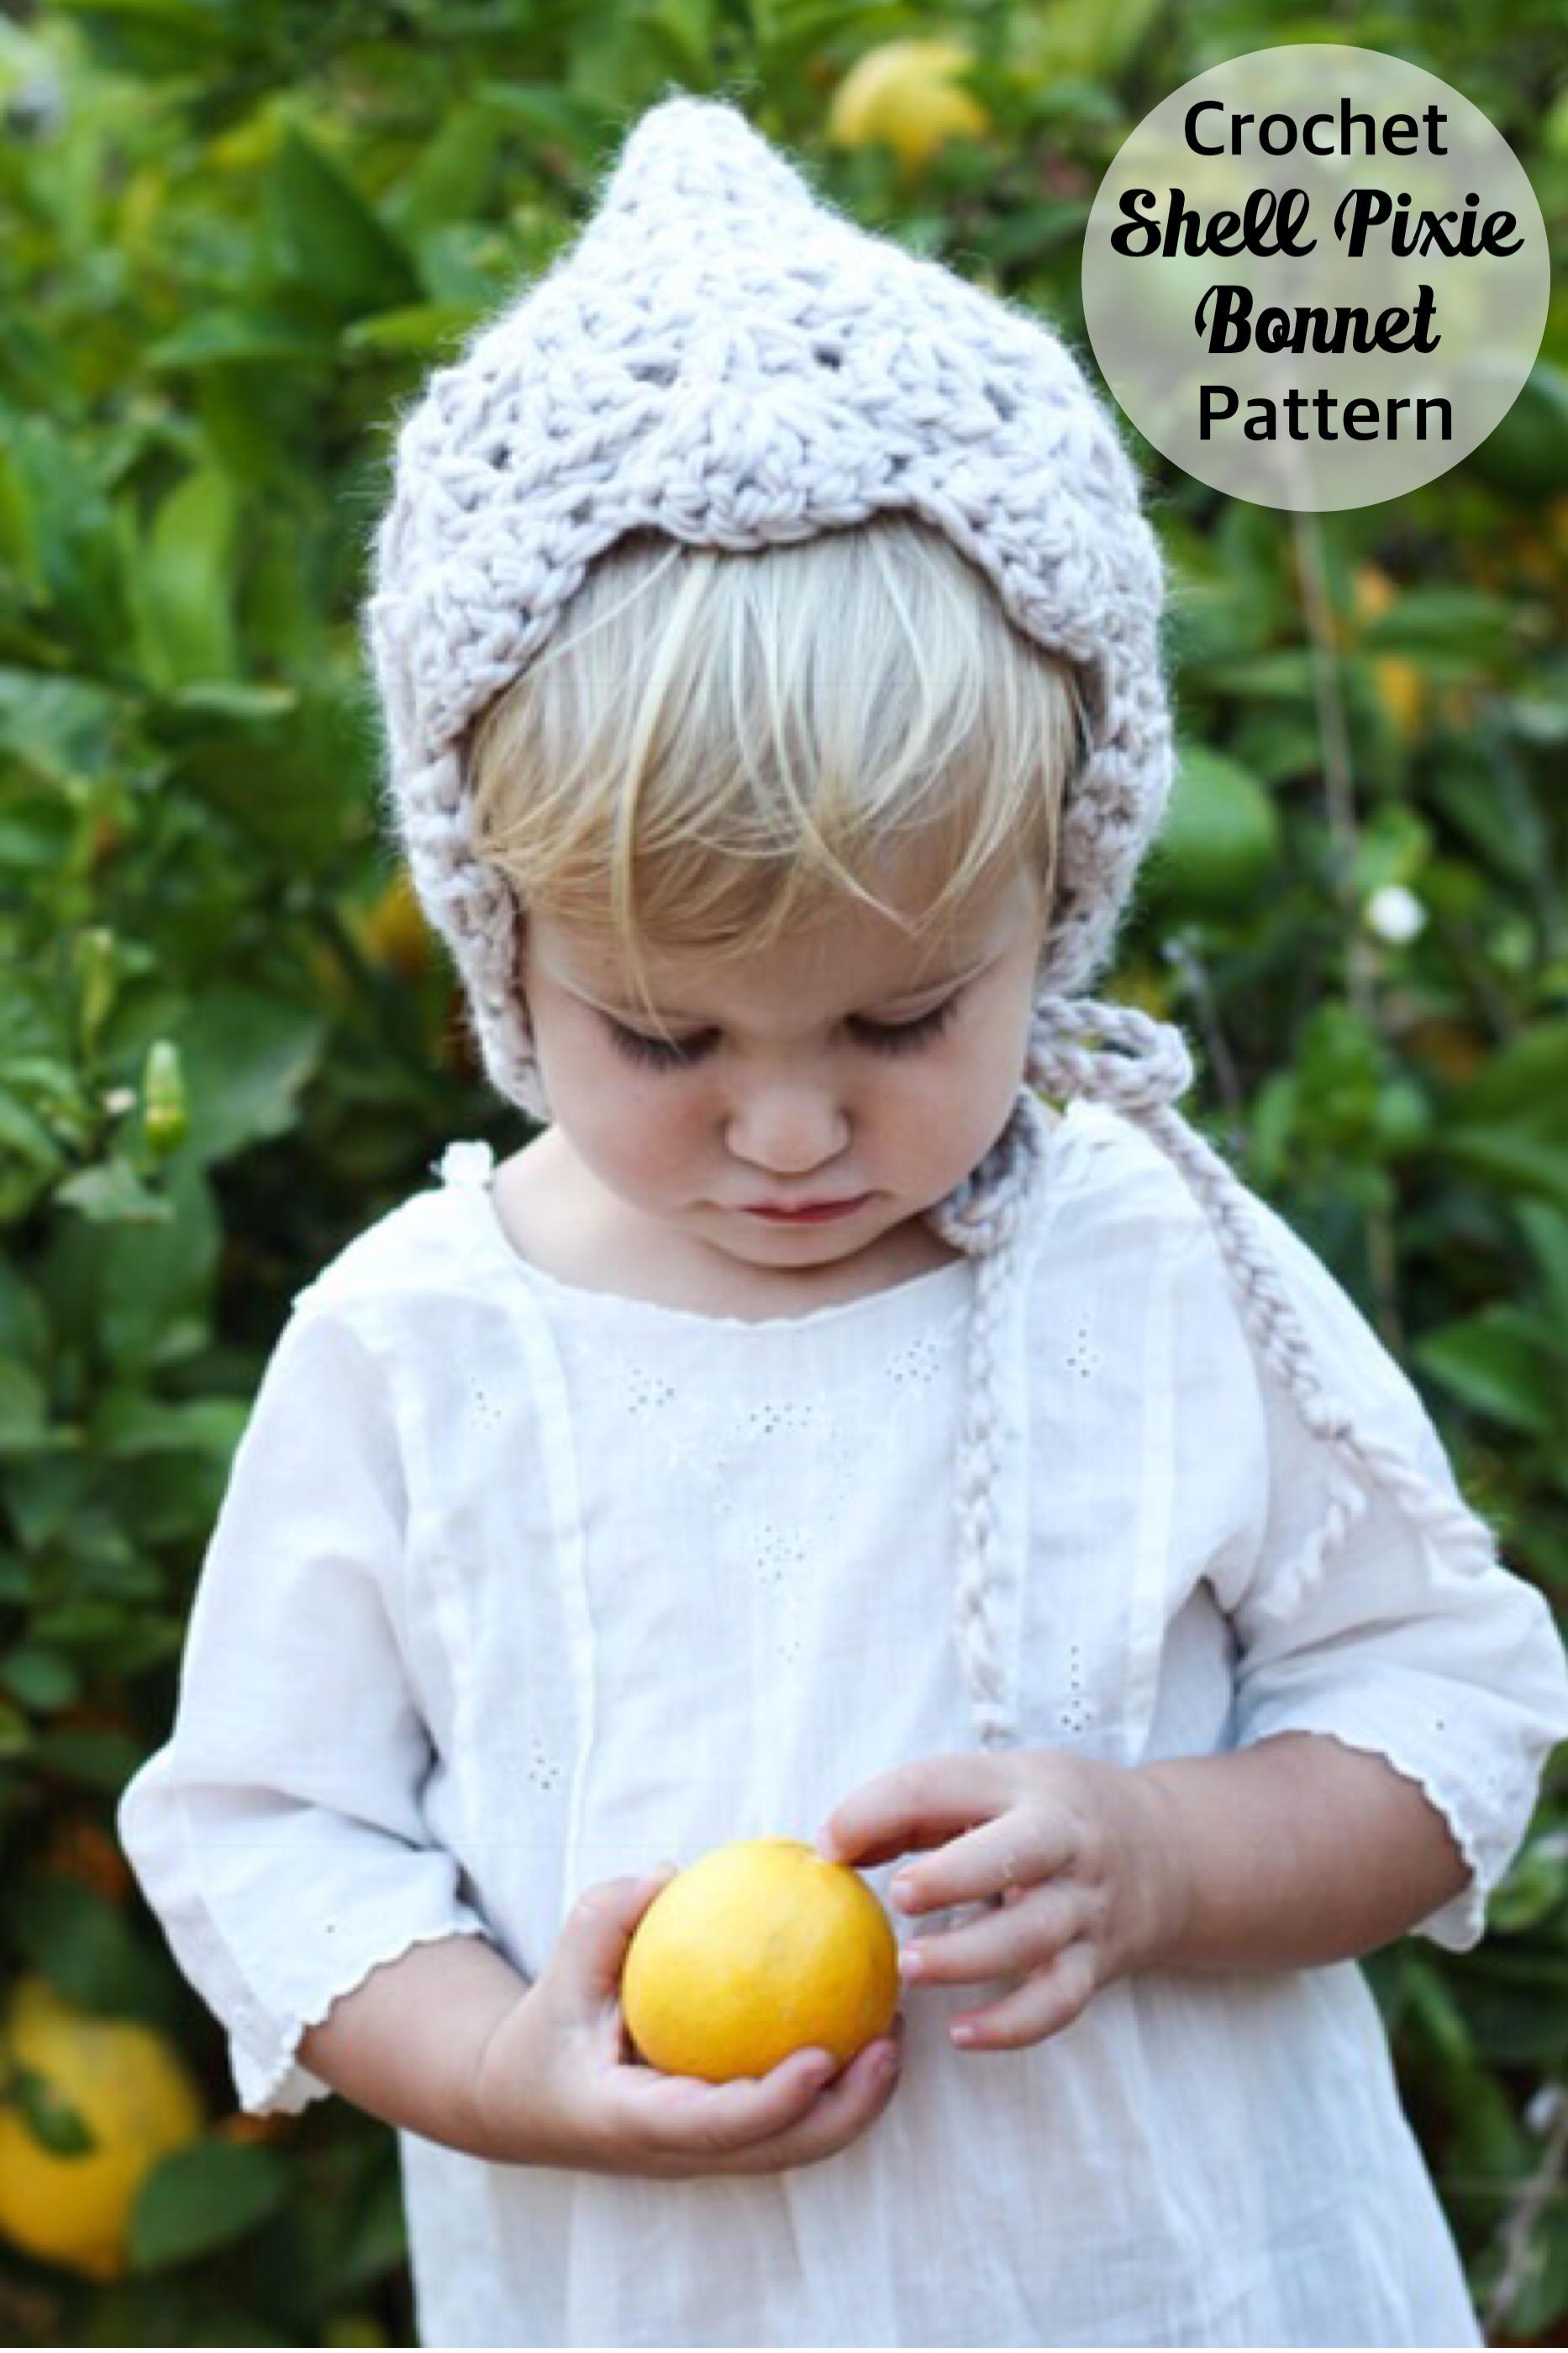 Pattern for Crochet Baby Pixie Bonnet